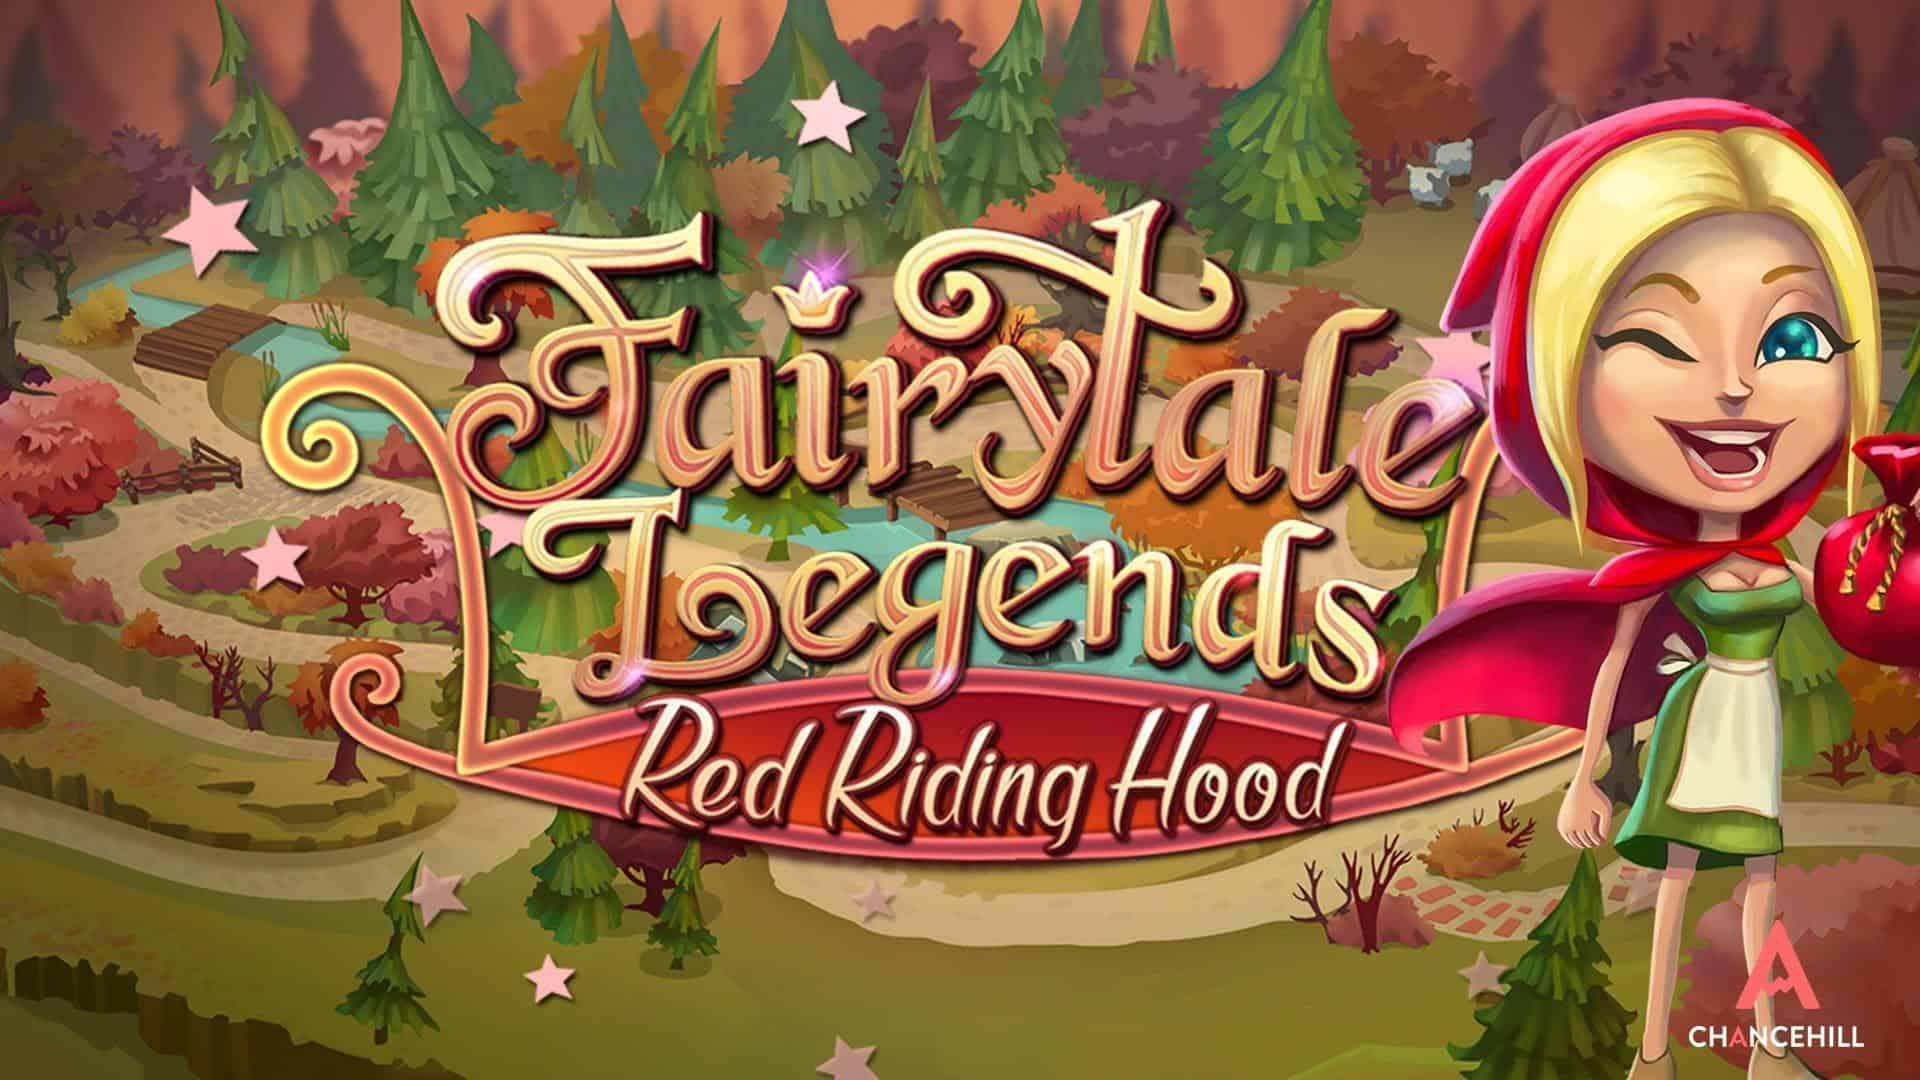 Fairytale Legends Red Riding Hood Slot Machine